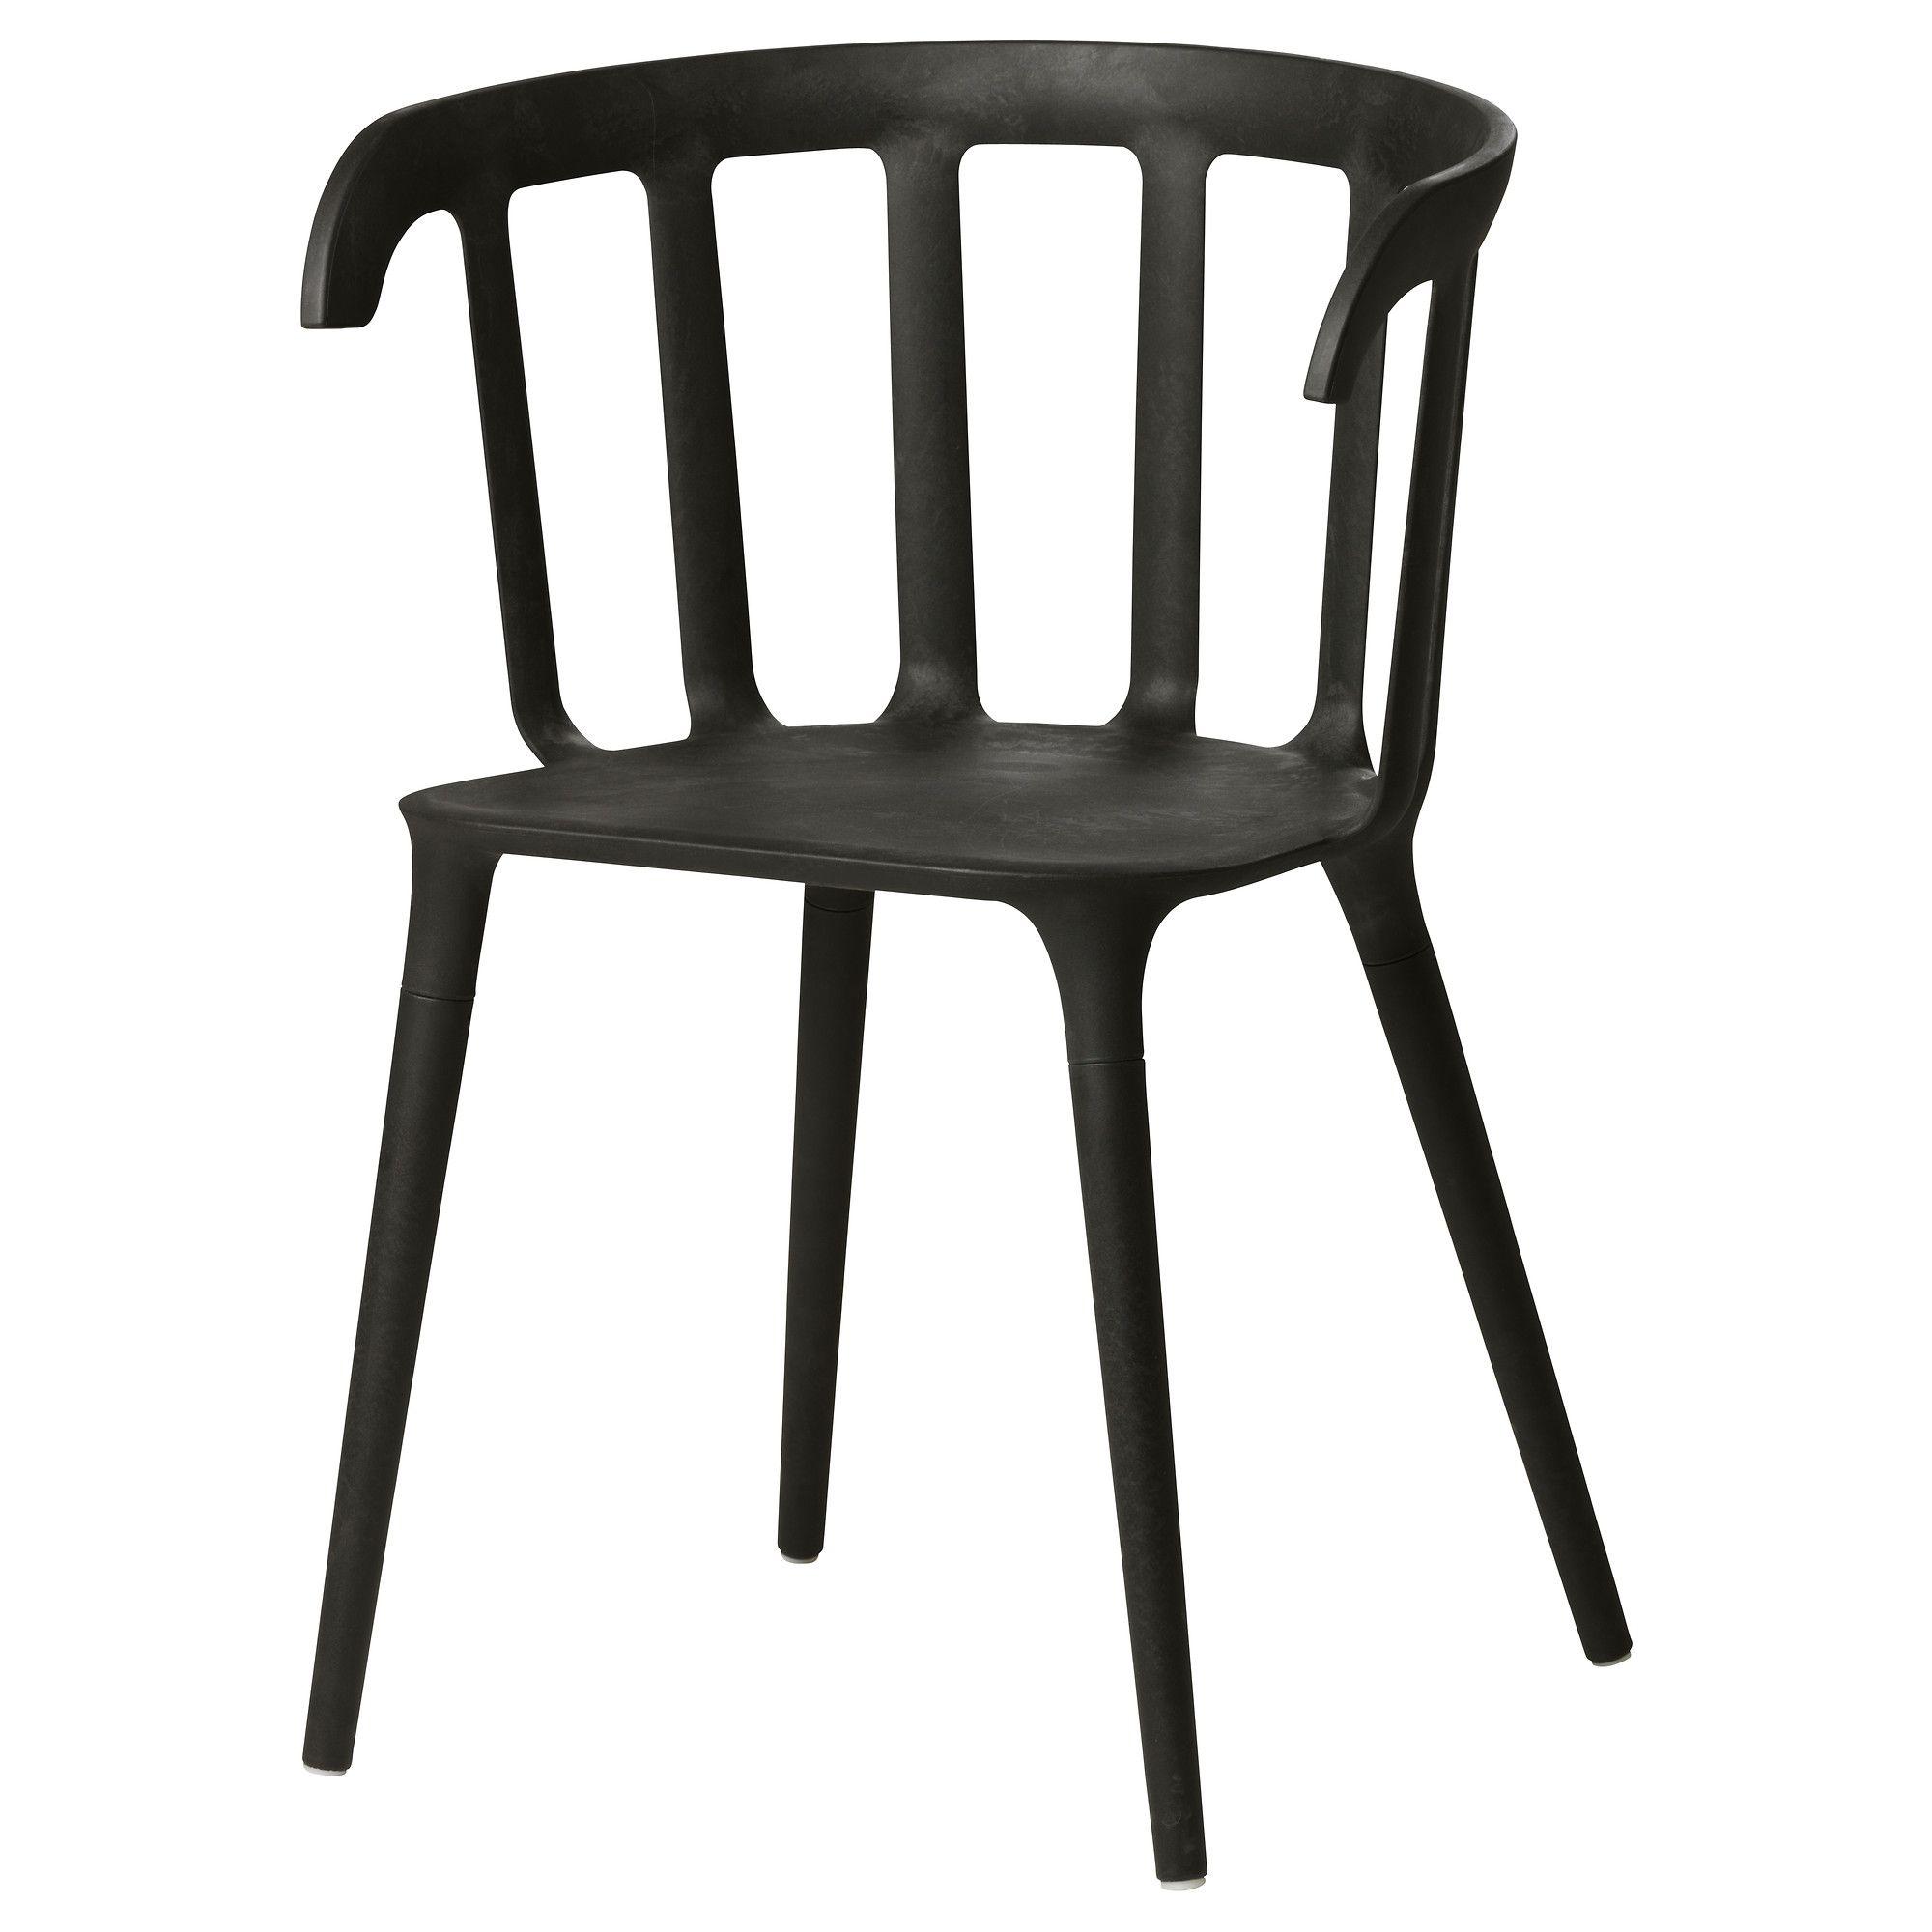 Sedia pieghevole ikea per la cucina. Home Outdoor Furniture Affordable Well Designed Ikea Dining Ikea Ps Ikea Ps 2012